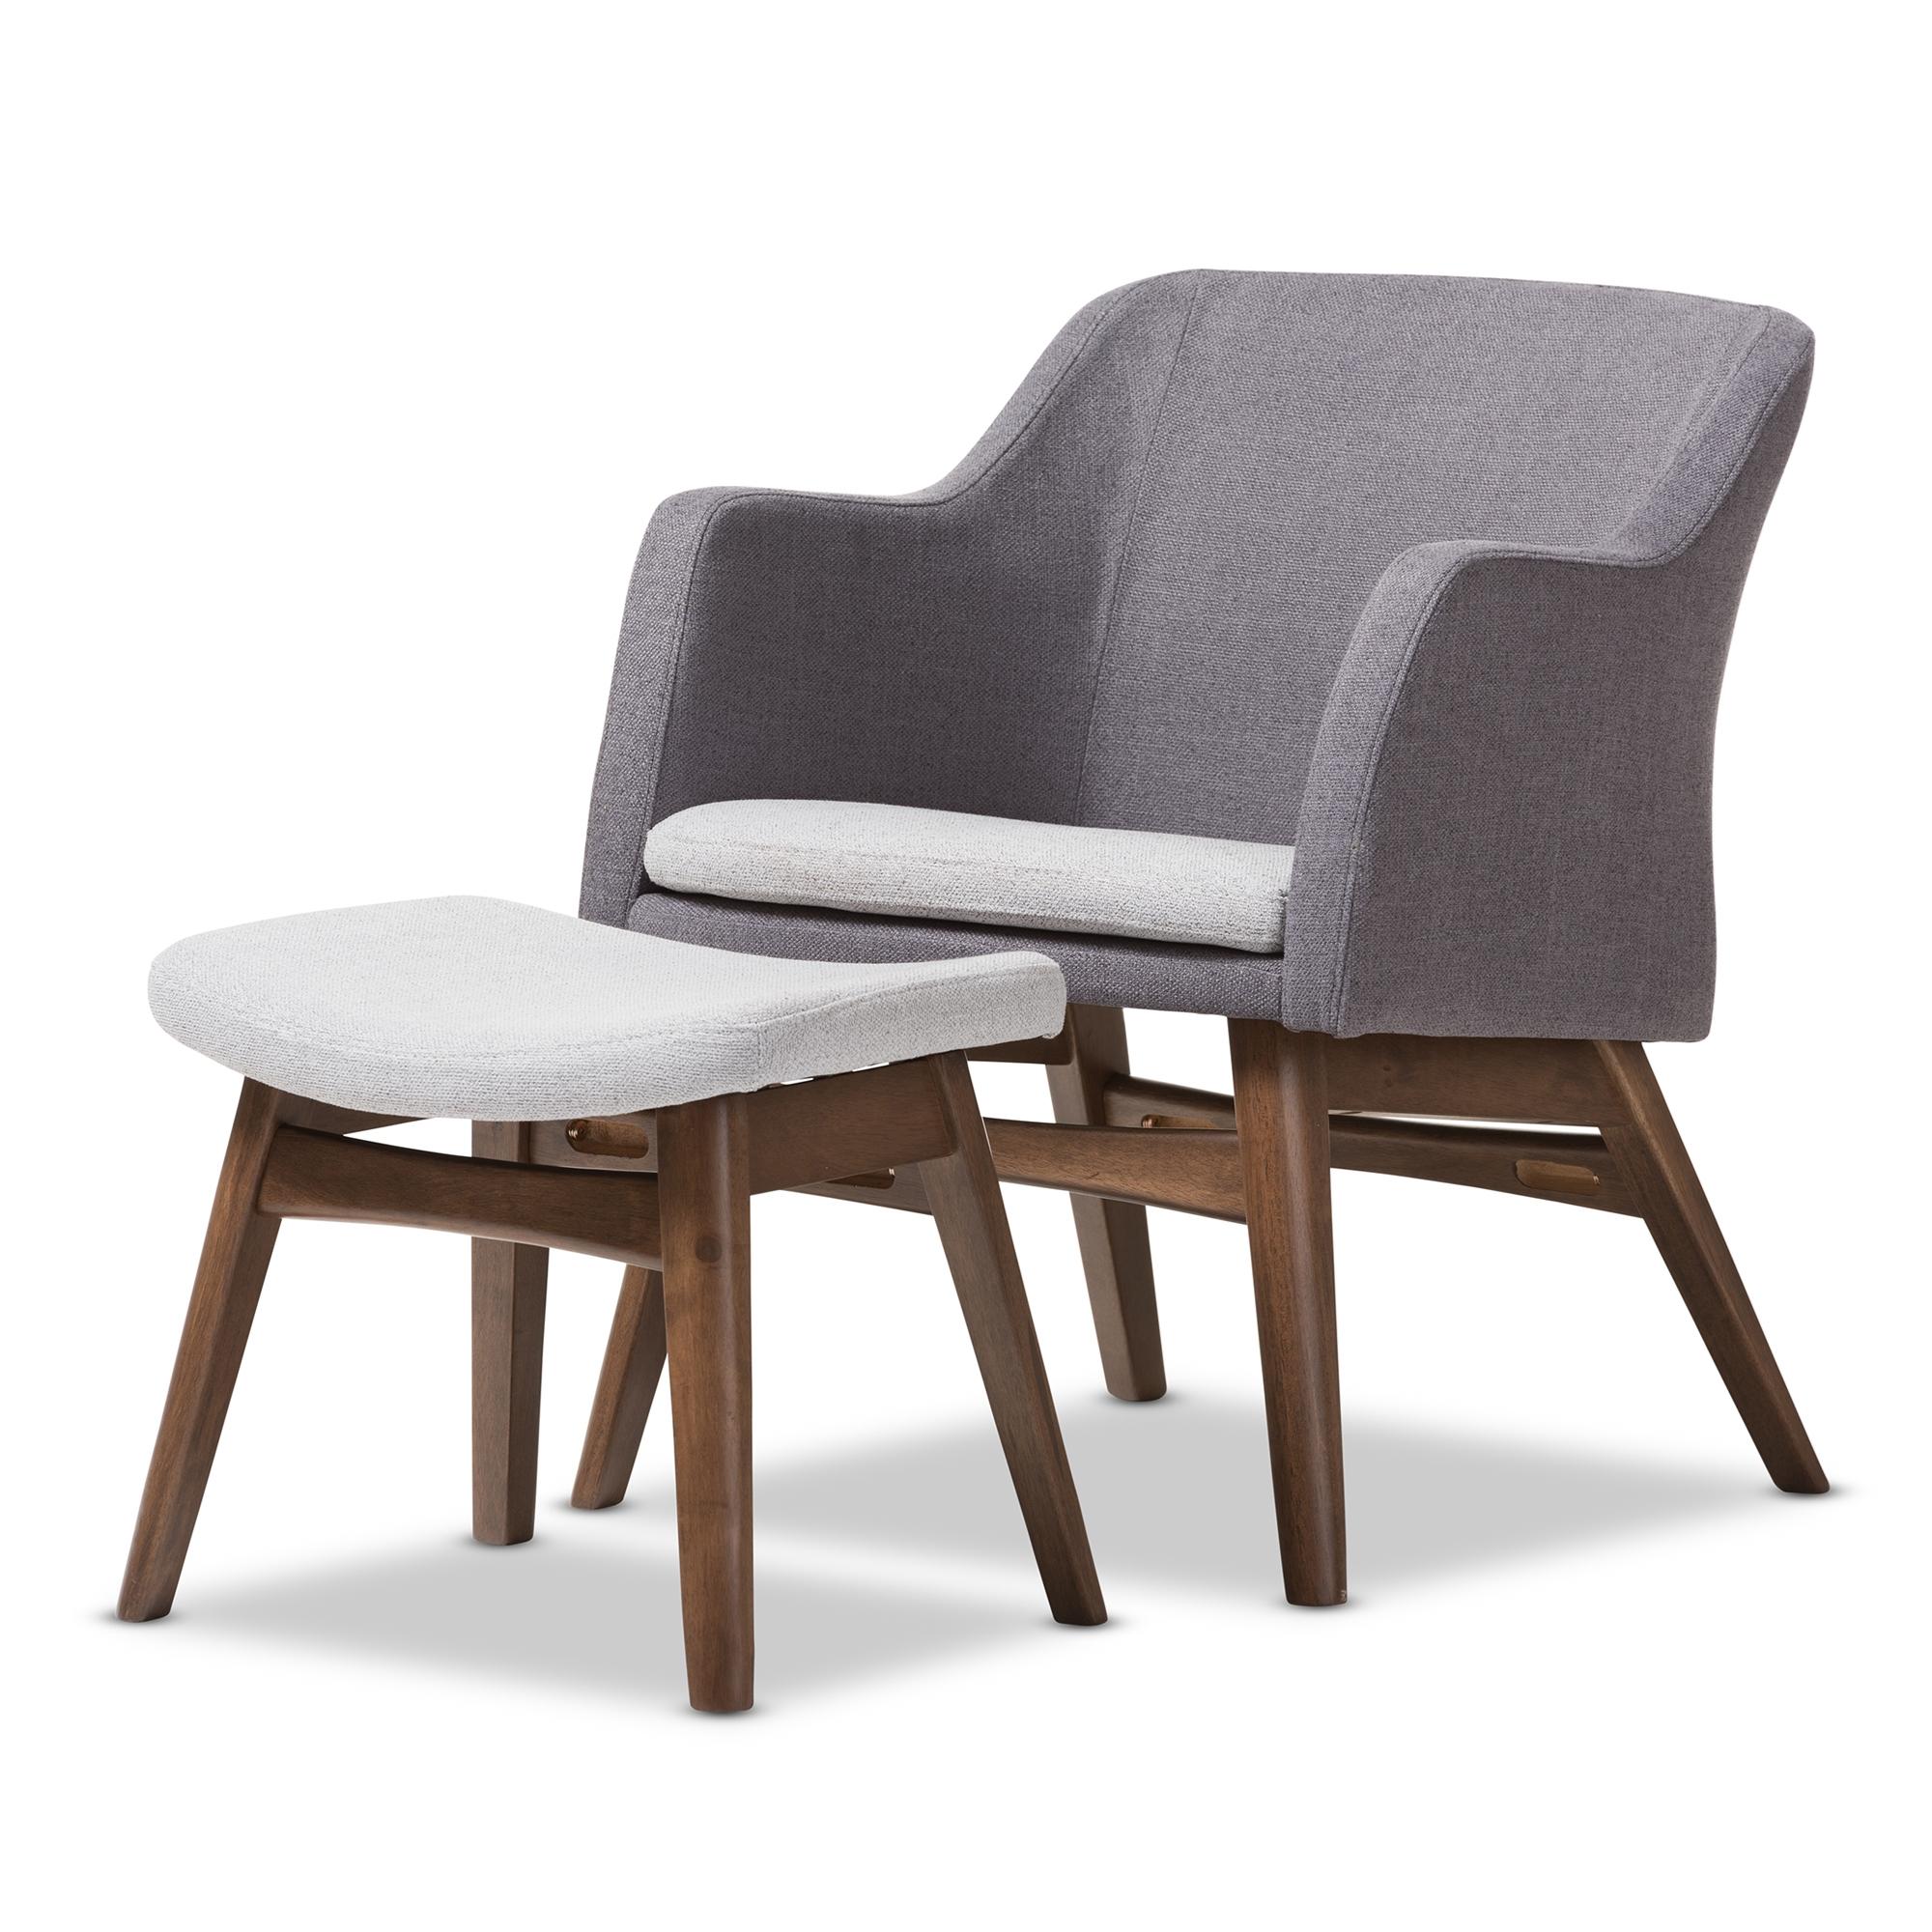 baxton studio vera midcentury modern twotone grey fabric lounge chair and ottoman set